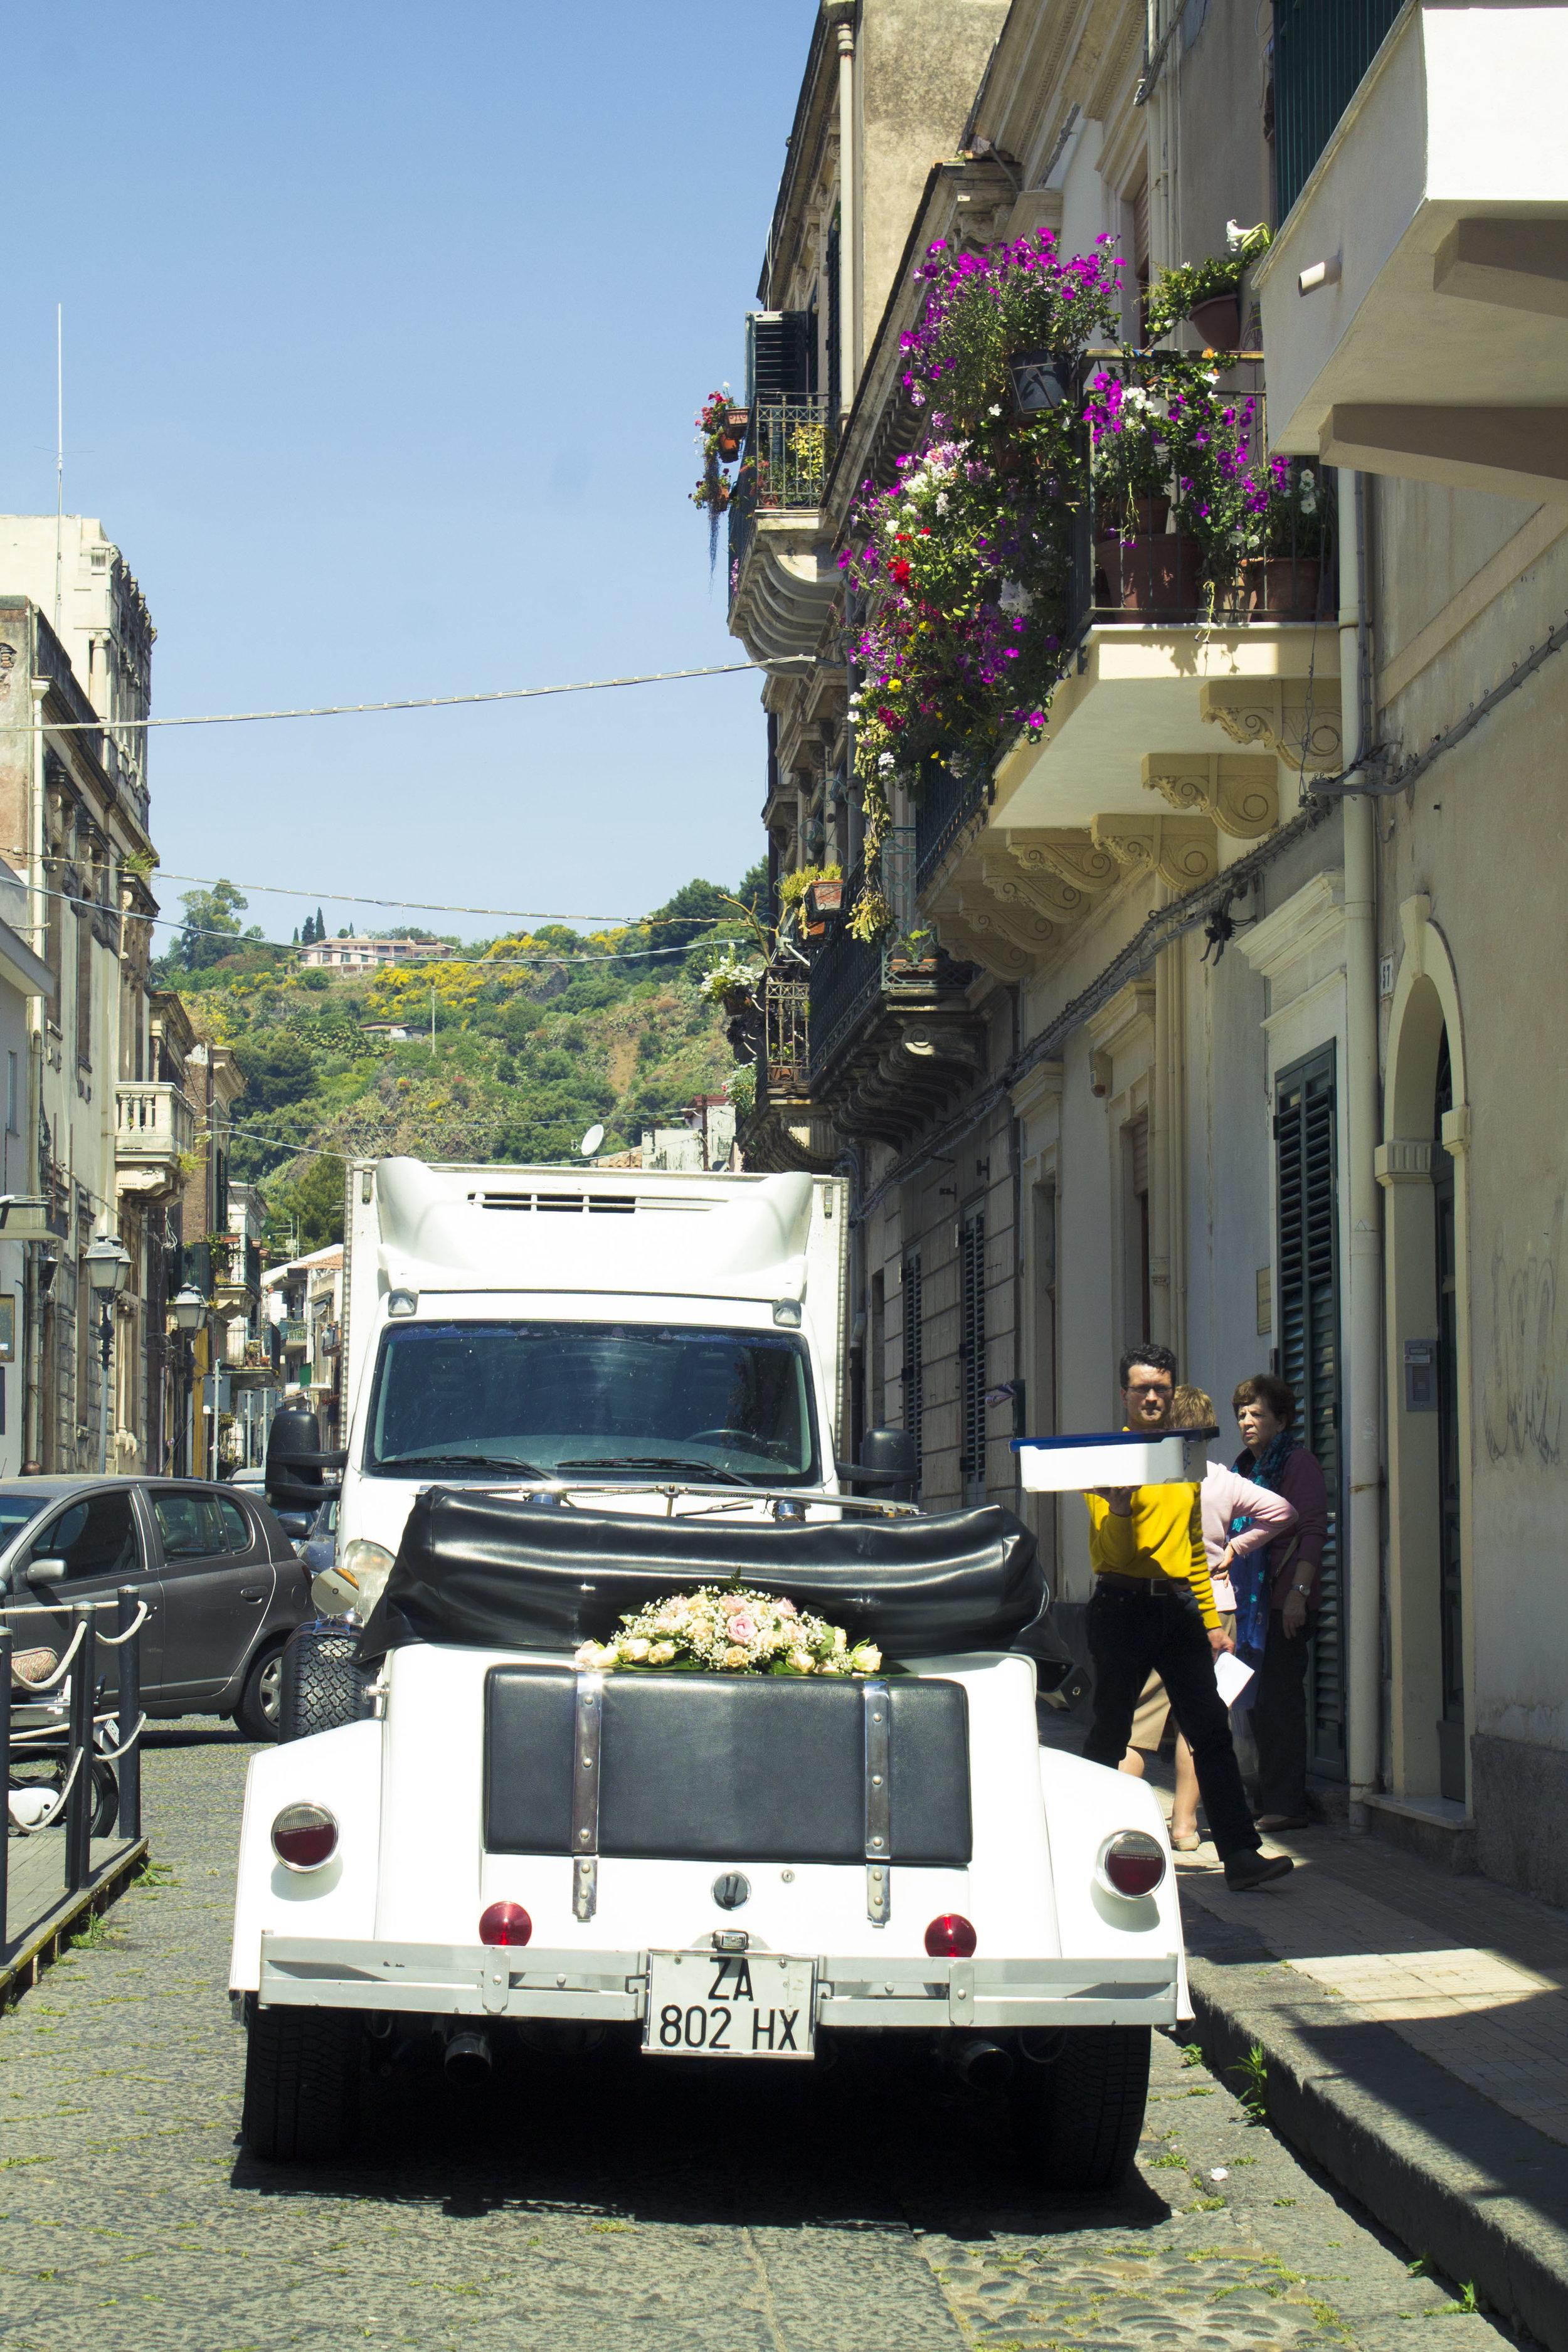 Traveling around Catania, Italy